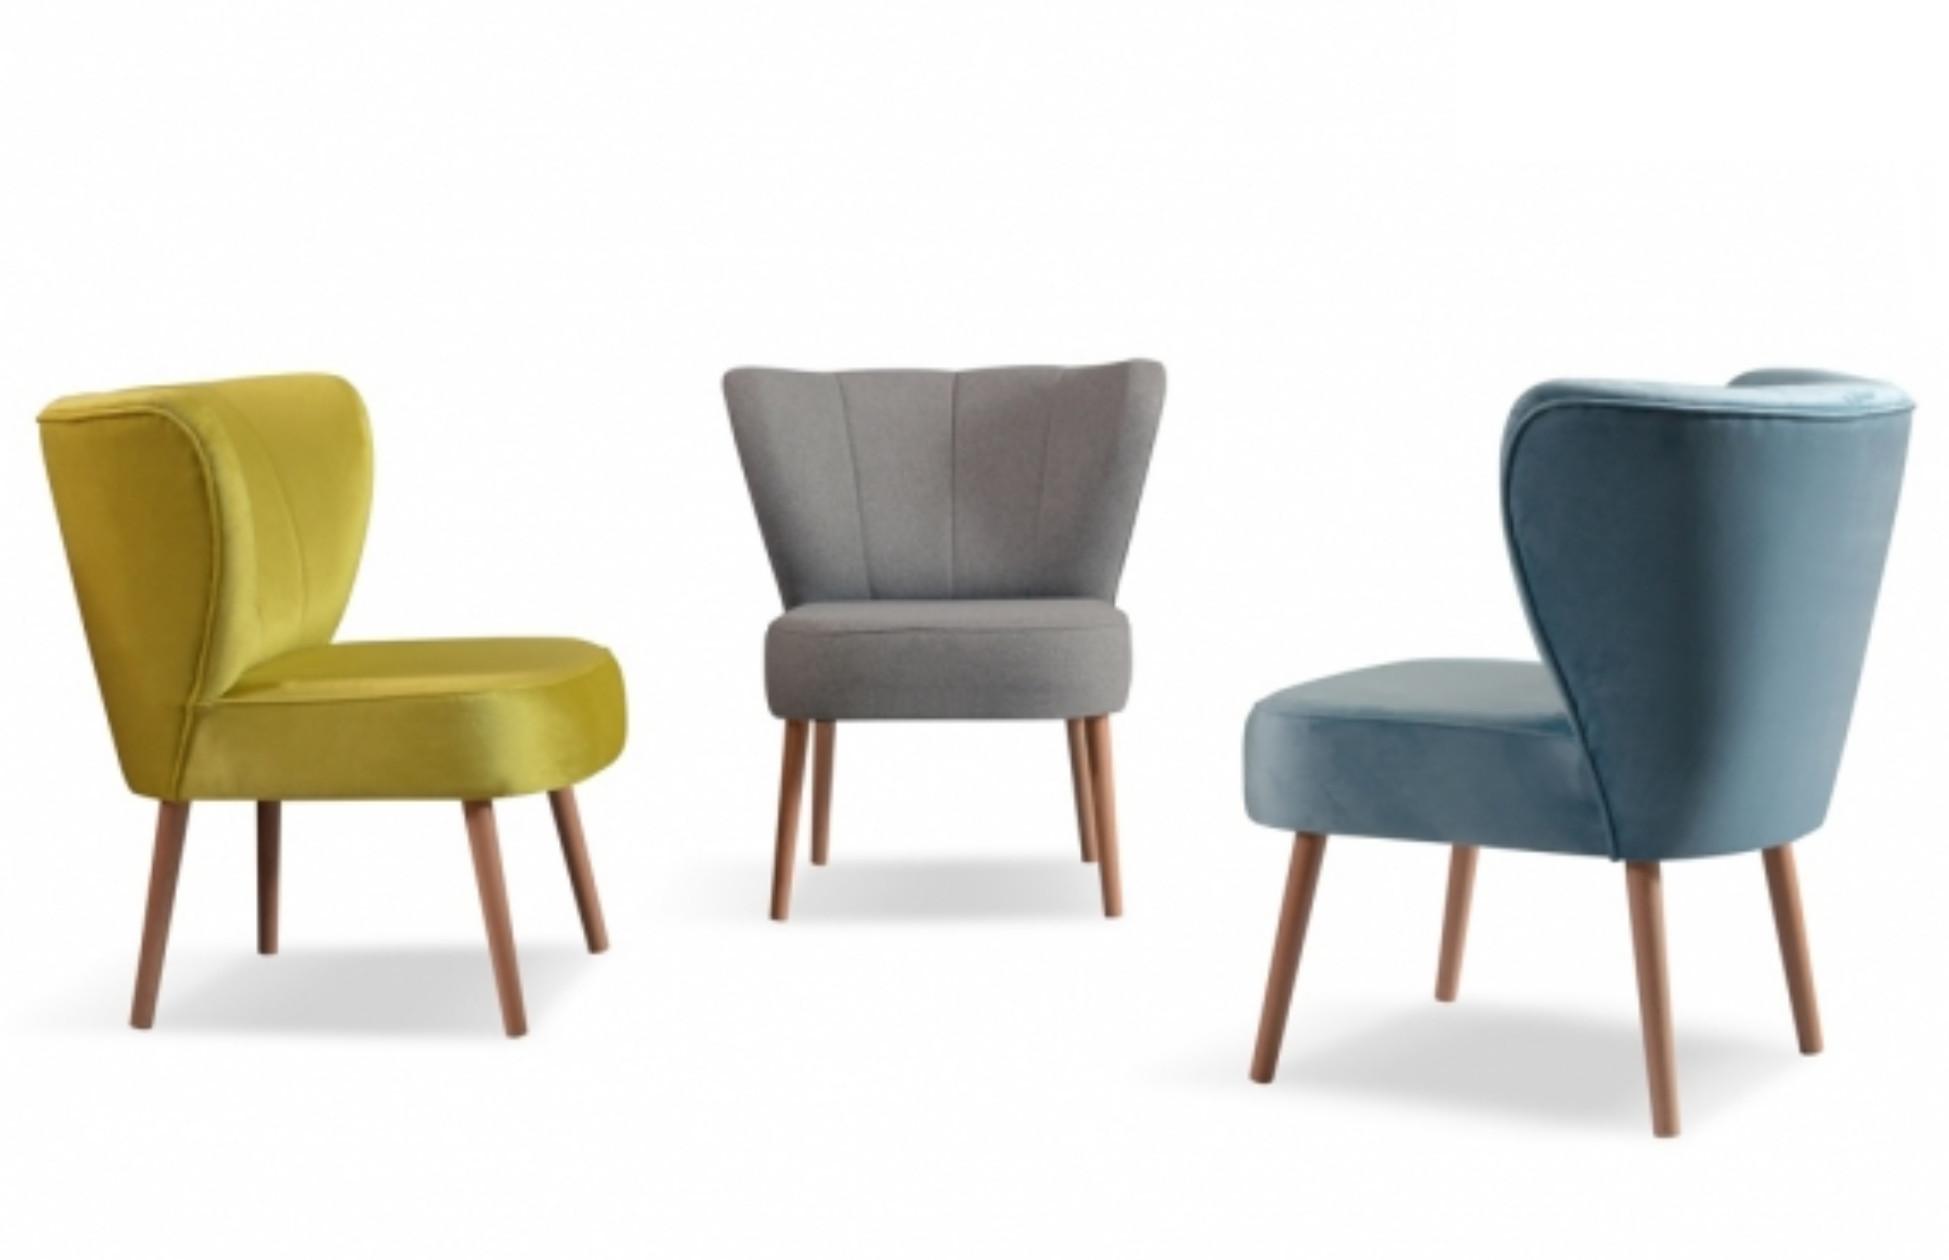 Fotele pokojowe